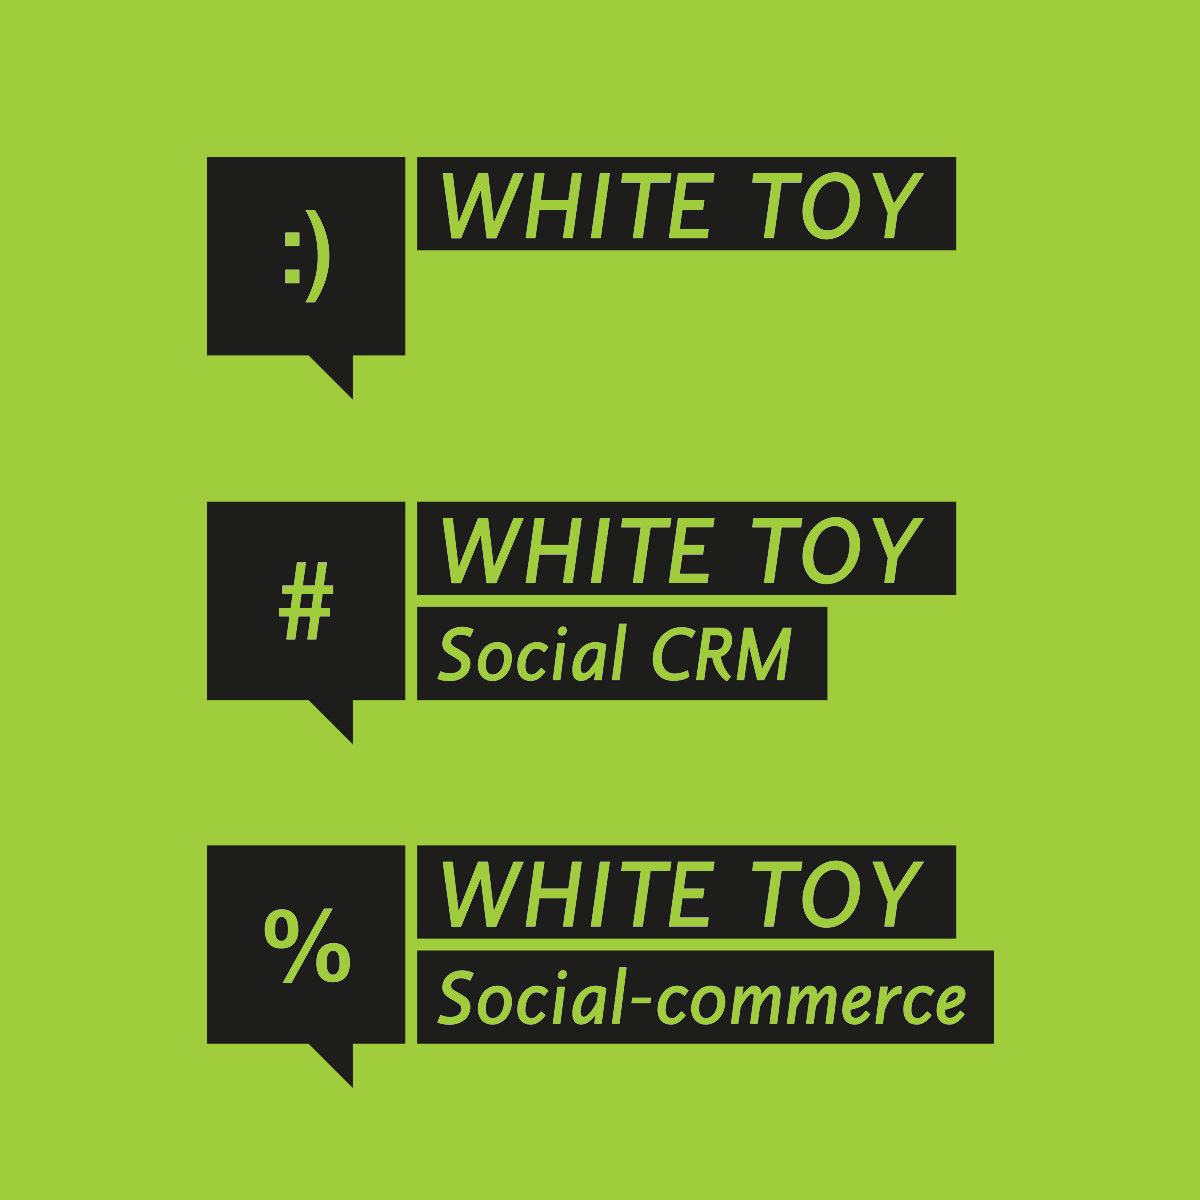 WhiteToy®. Le nostre tecnologie utili